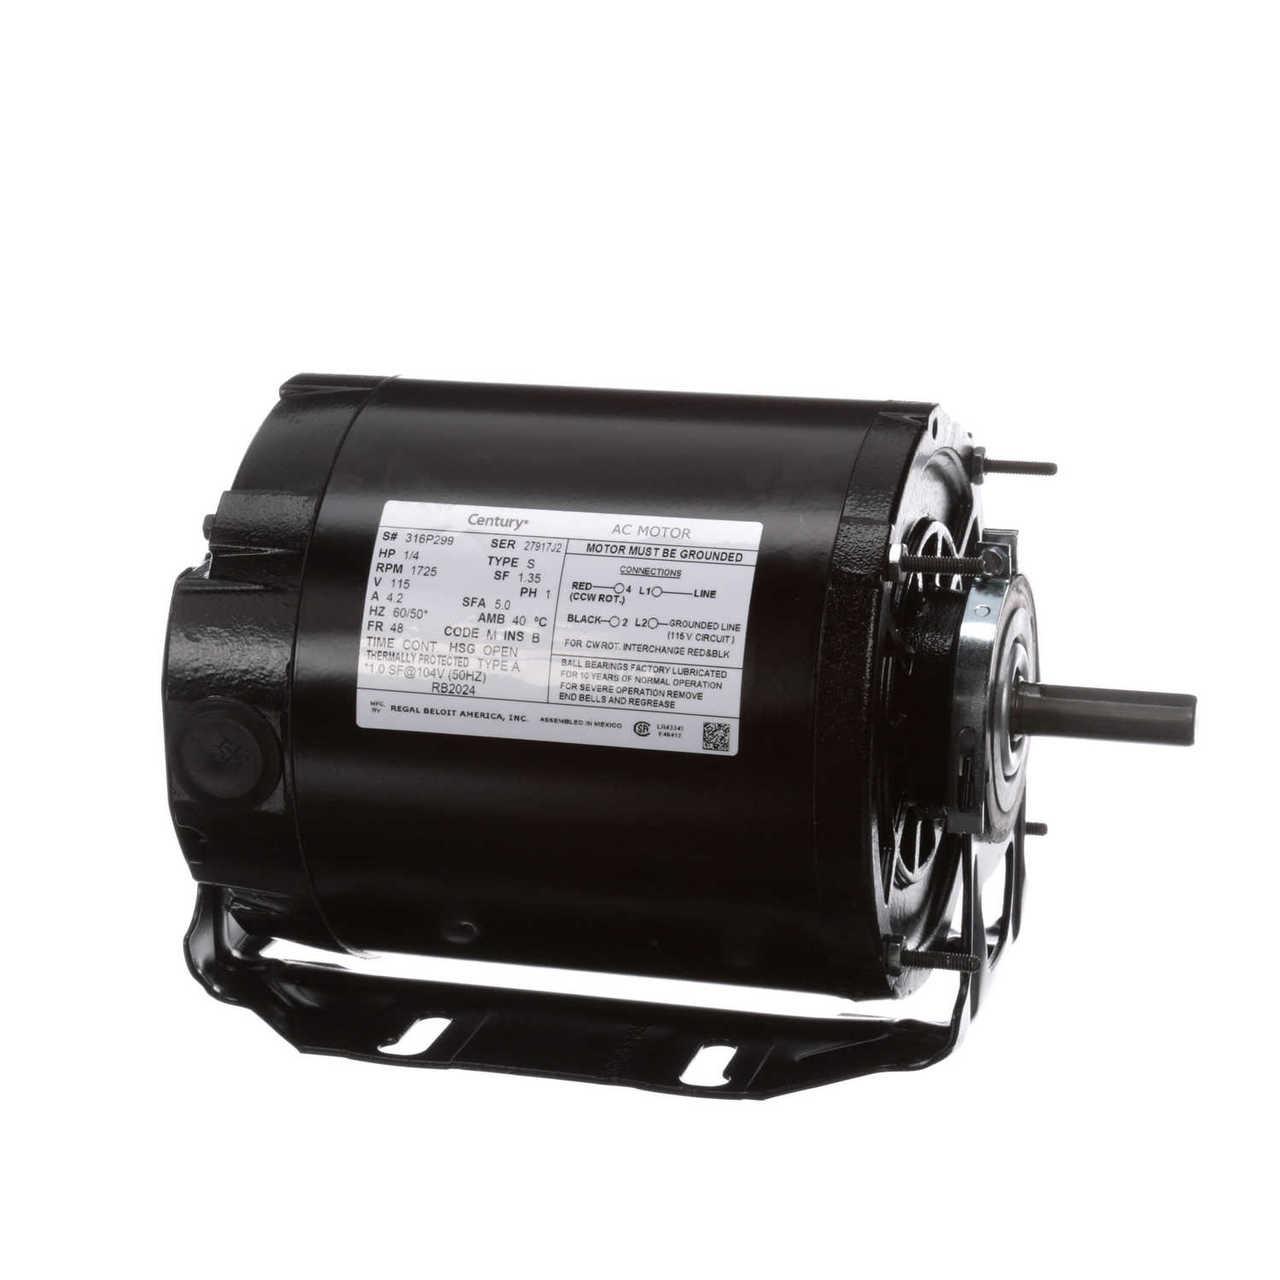 Century GF2024 1//4 for hp 1725 RPM 48 Frame 115V Belt Drive Furnace Motor